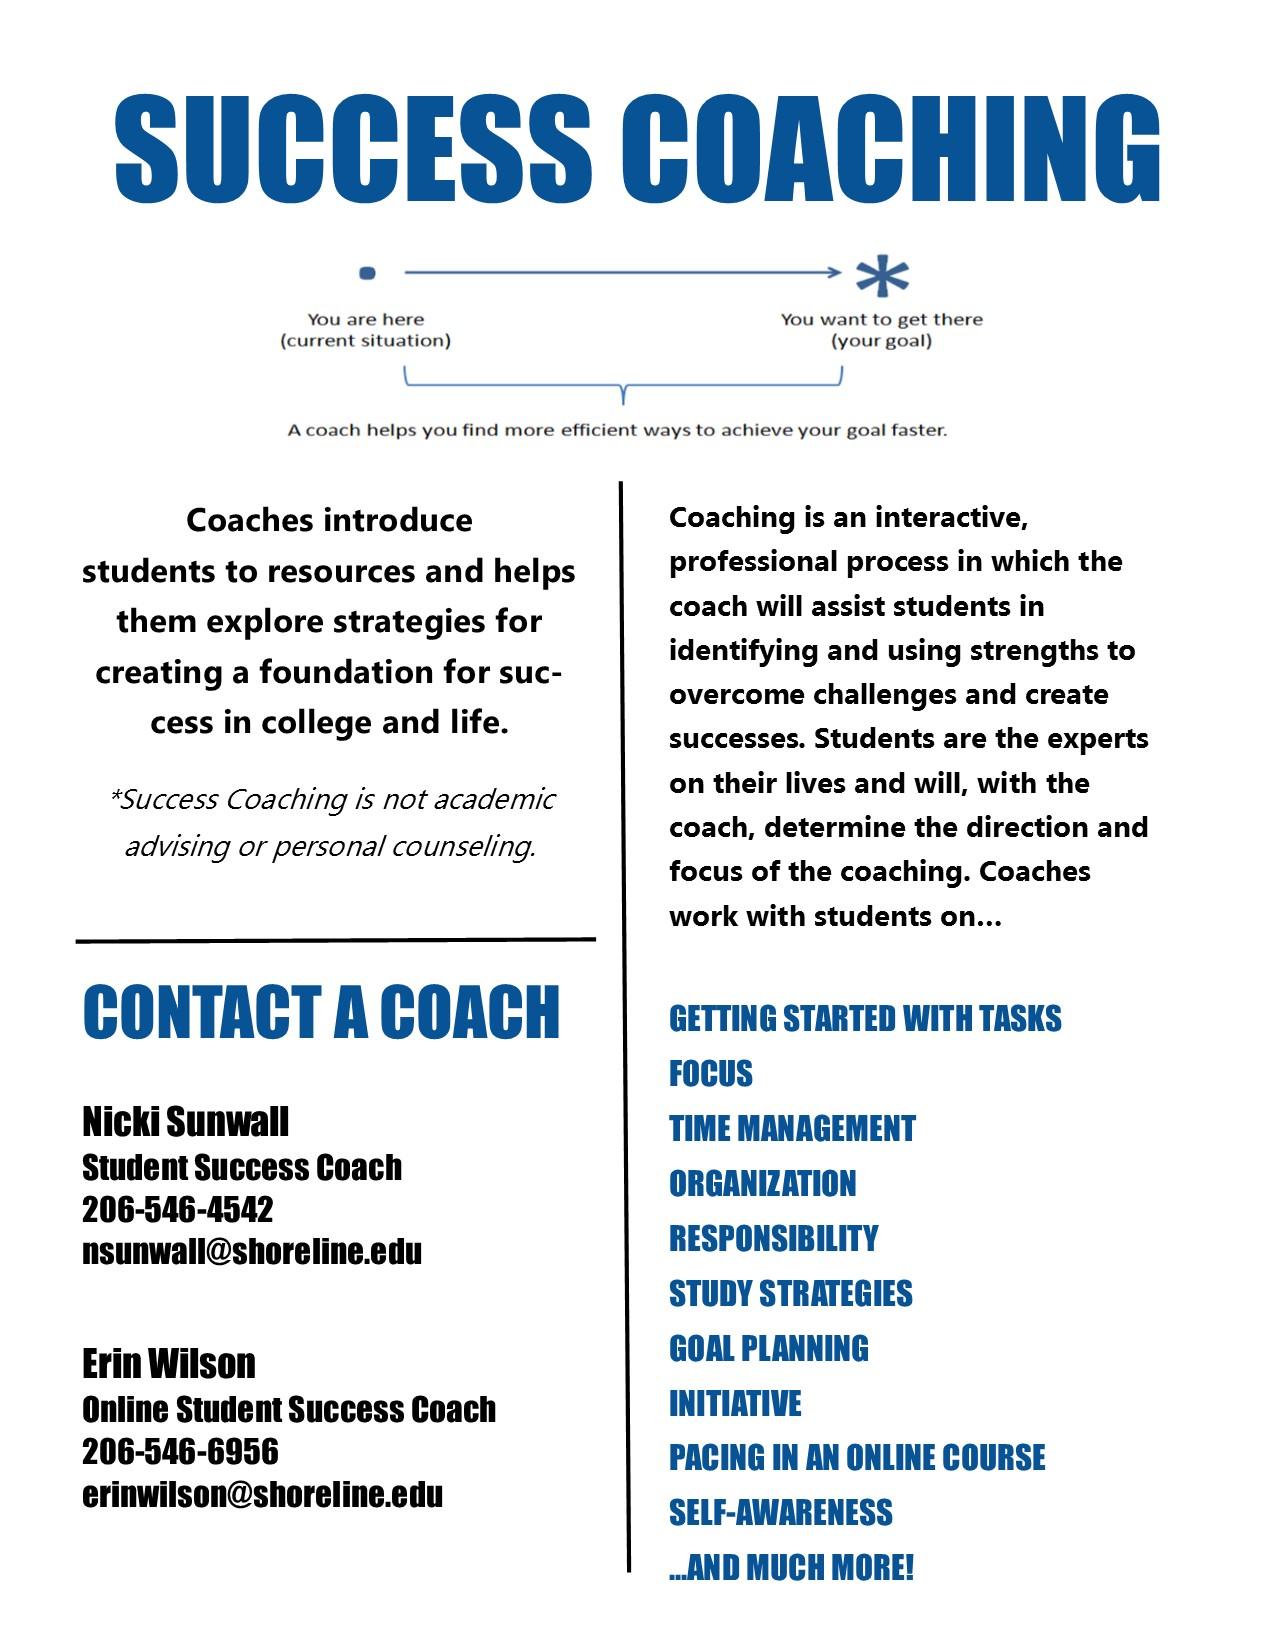 2016-2017-succes-coaching13